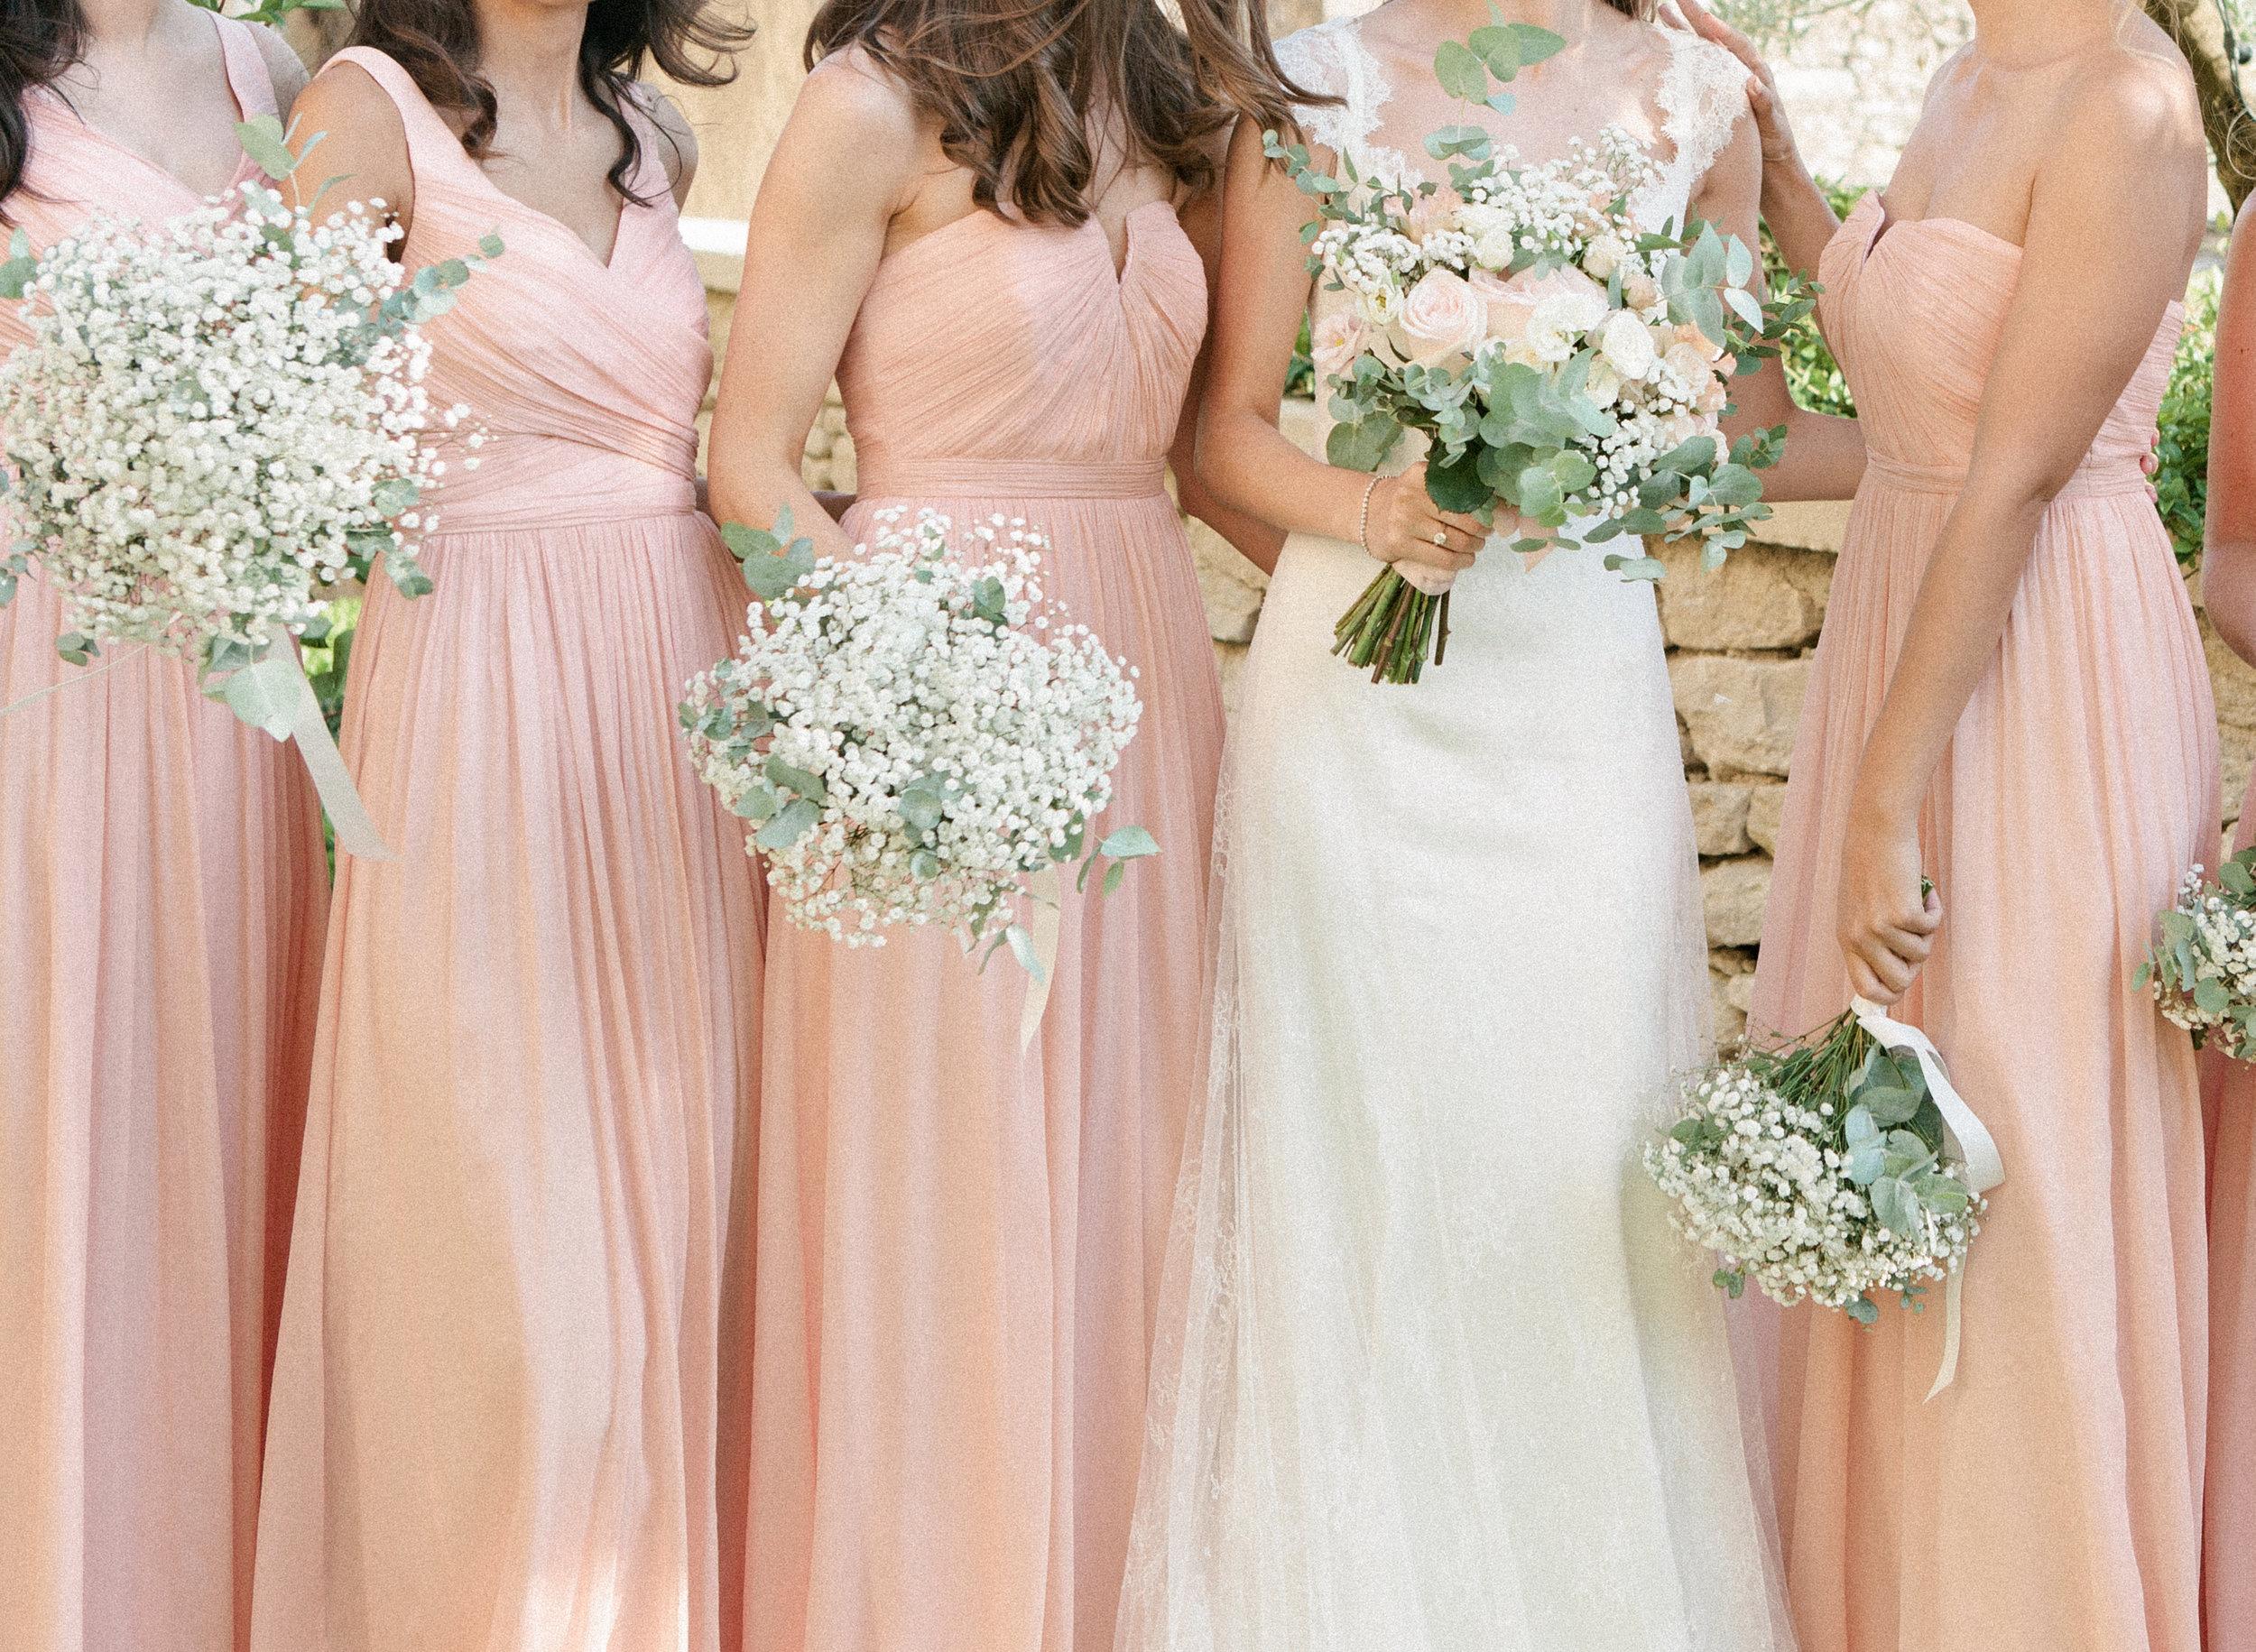 provence-wedding-rory-wylie.jpg-75.jpg